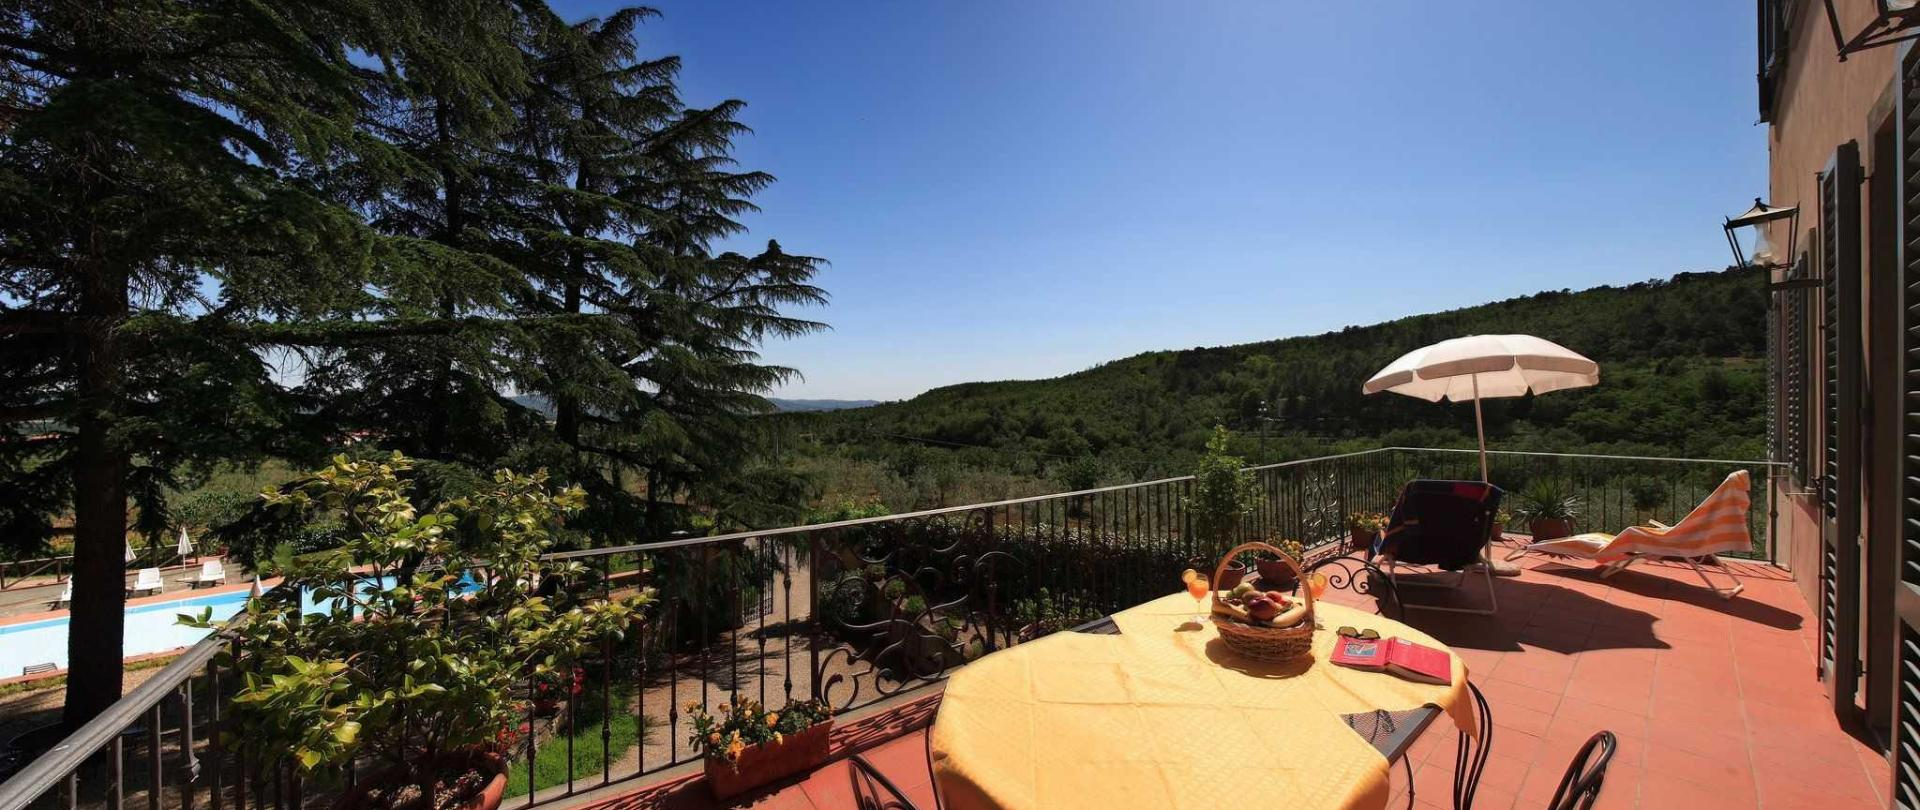 leonardo-da-vinci-suite-first-floor-terrace-villa.jpg